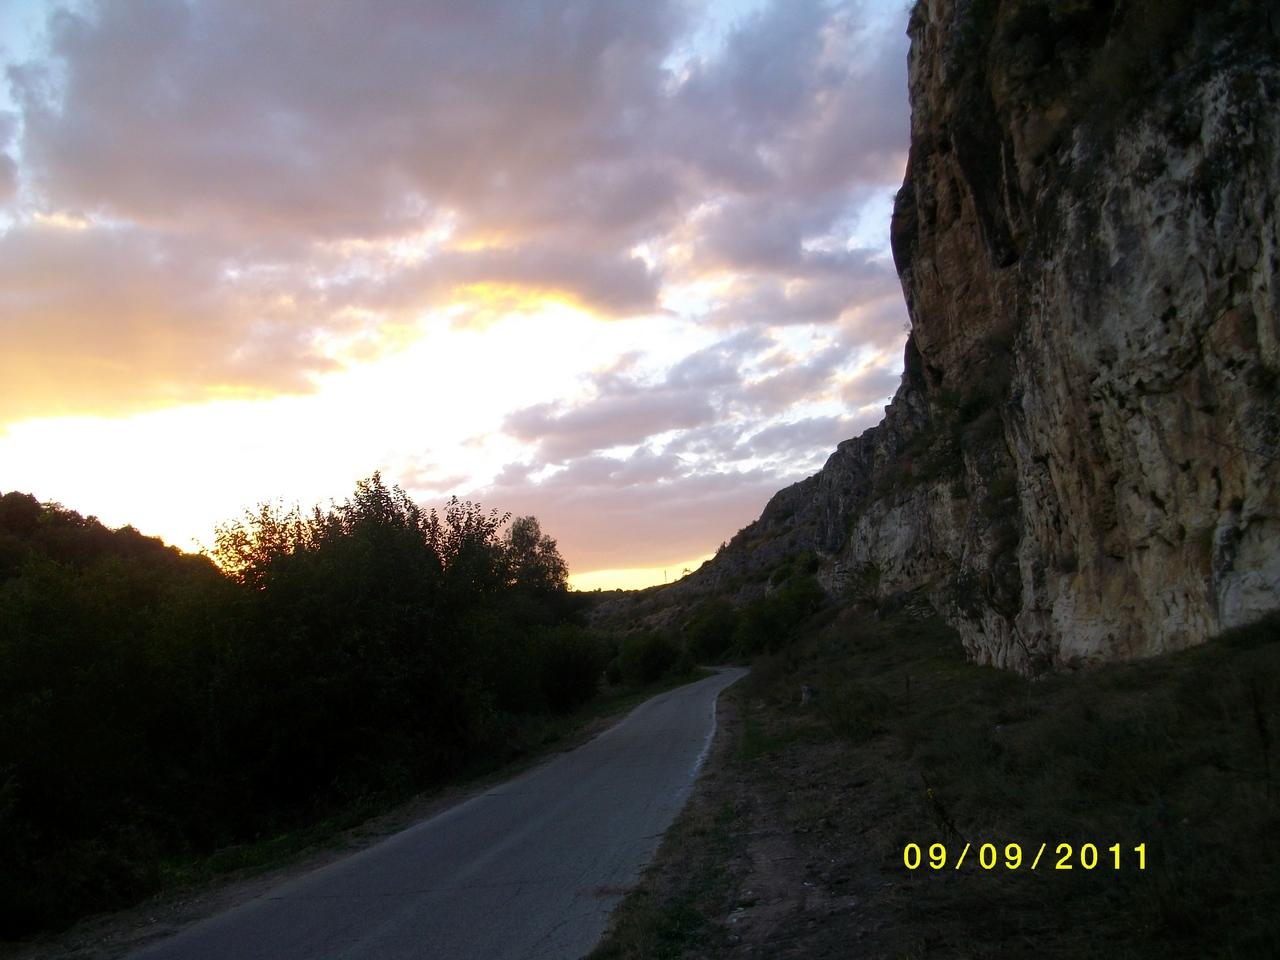 домв село табачка,болгария 80кв.м и земля под ним 950кв.м цена 7000 евро,00359878600910